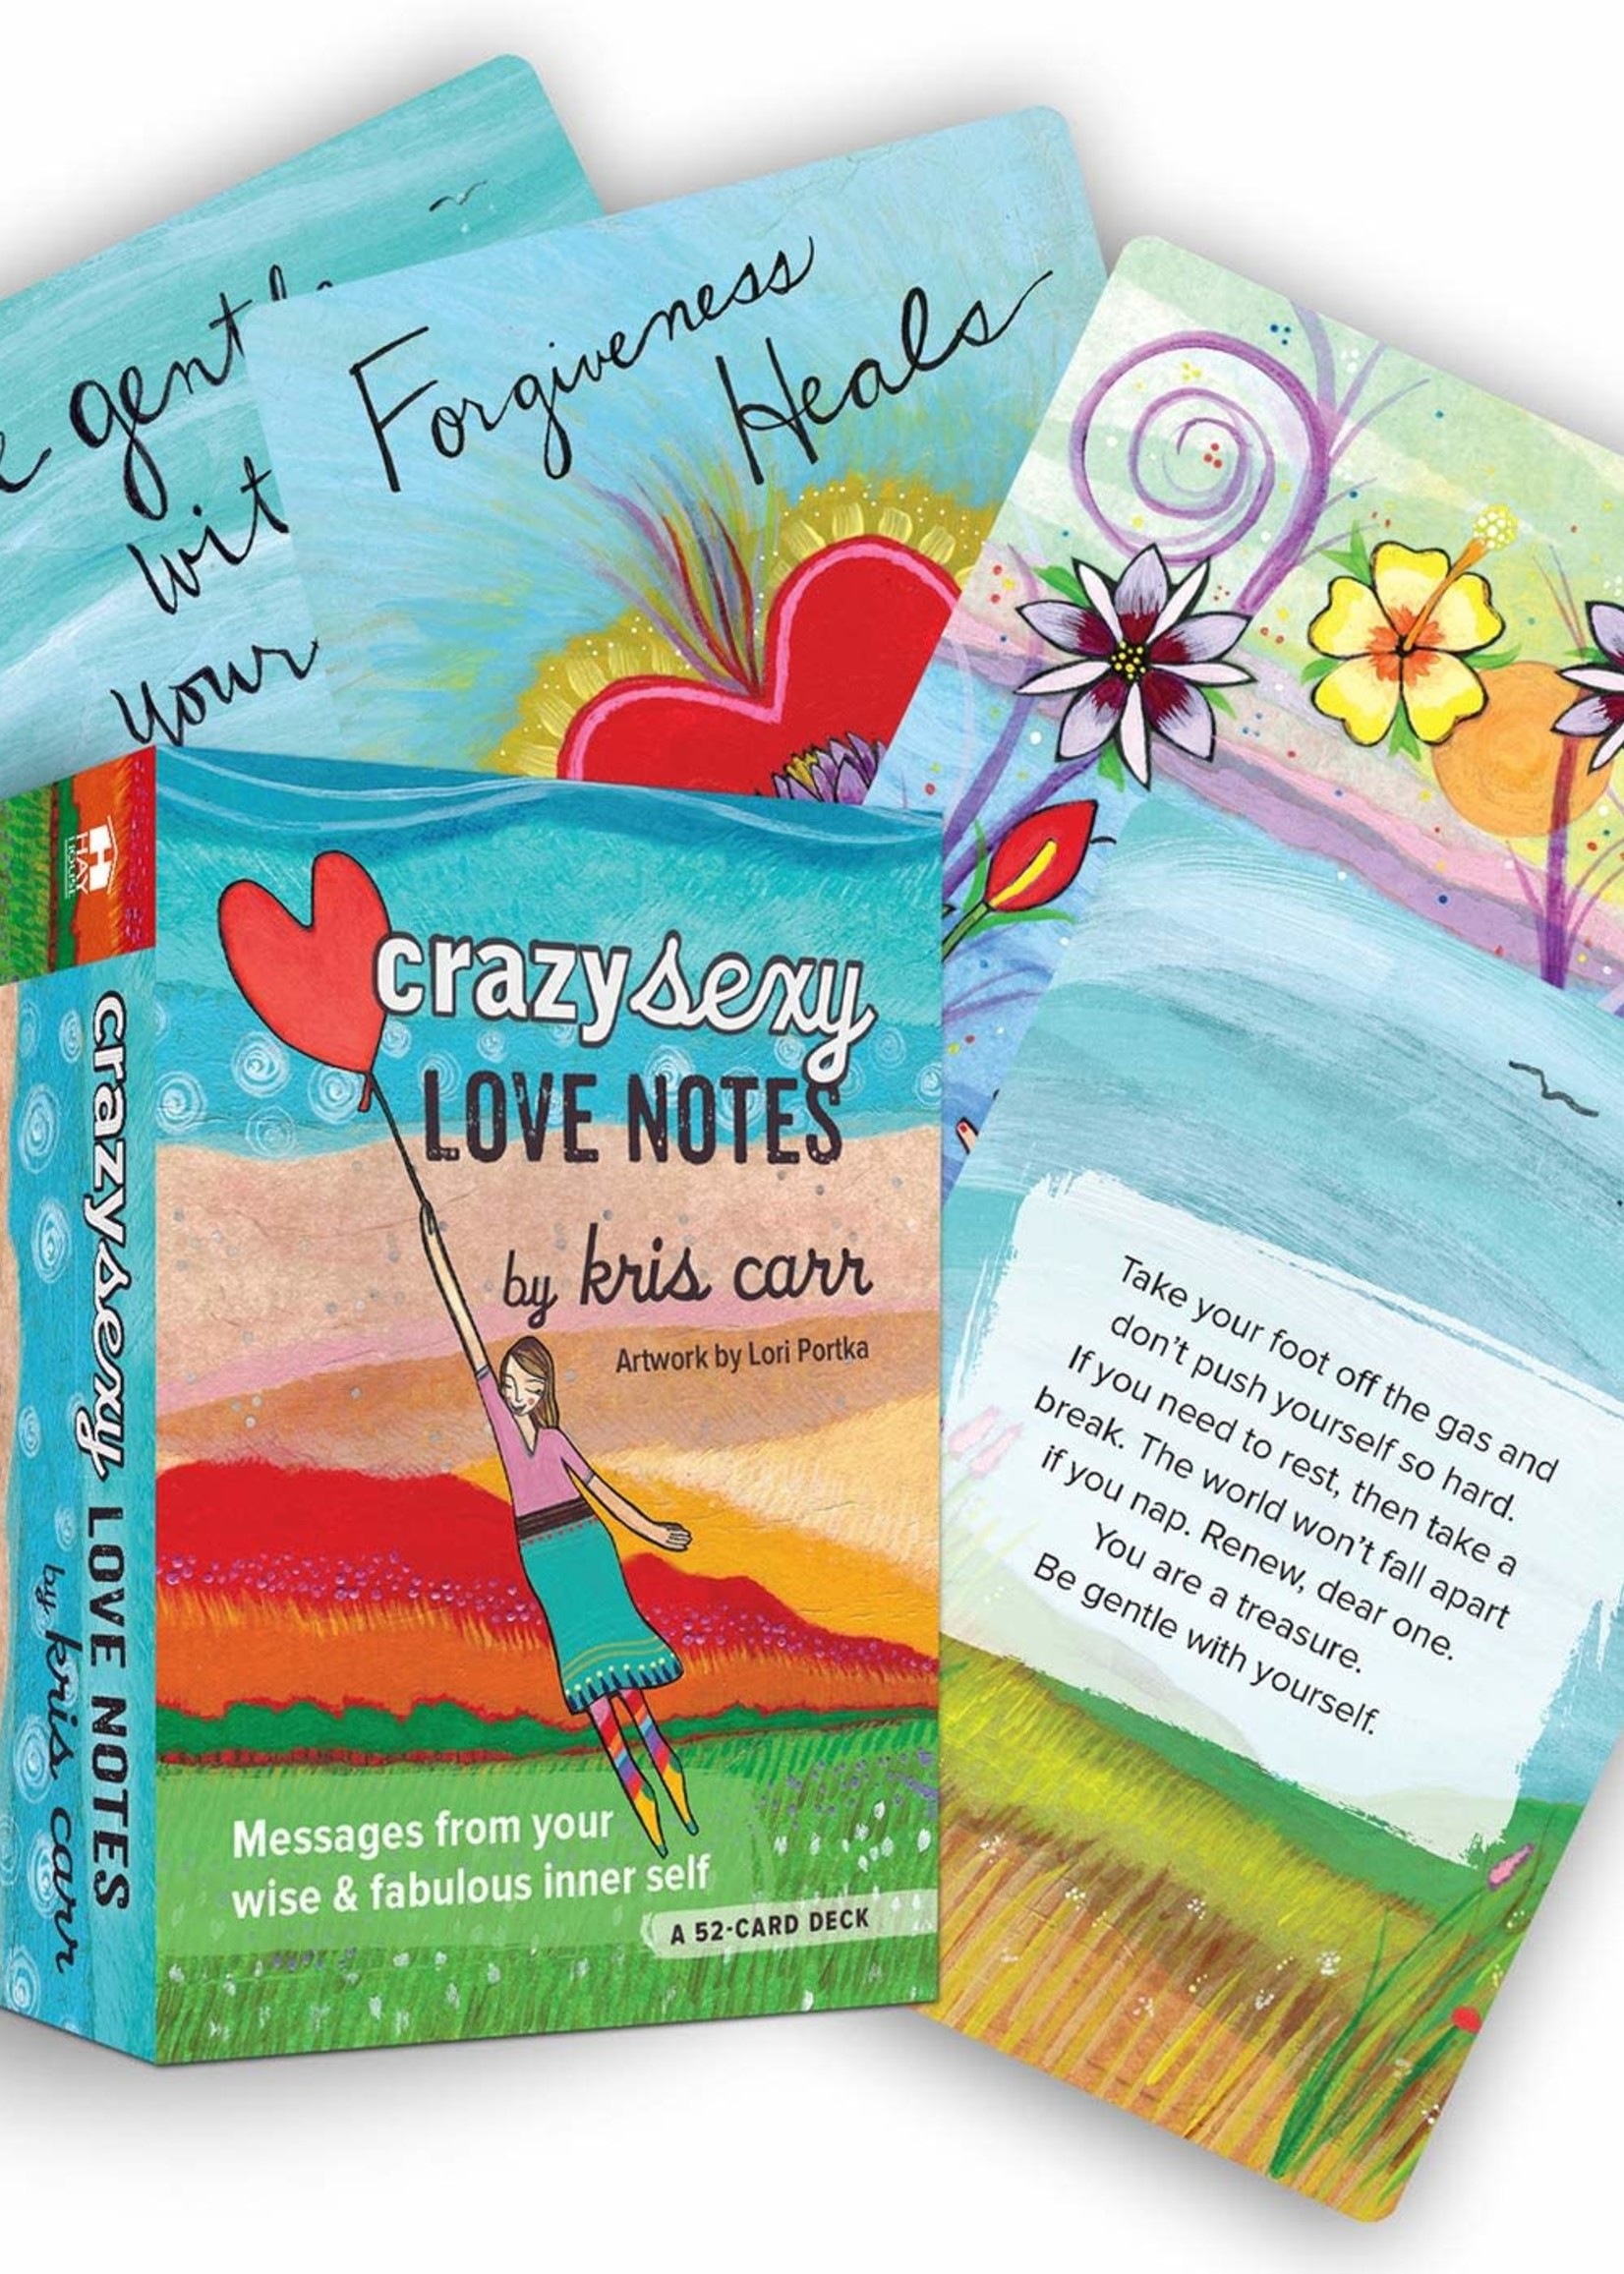 Deck Crazy Sexy Love Notes: A 52-Card Deck